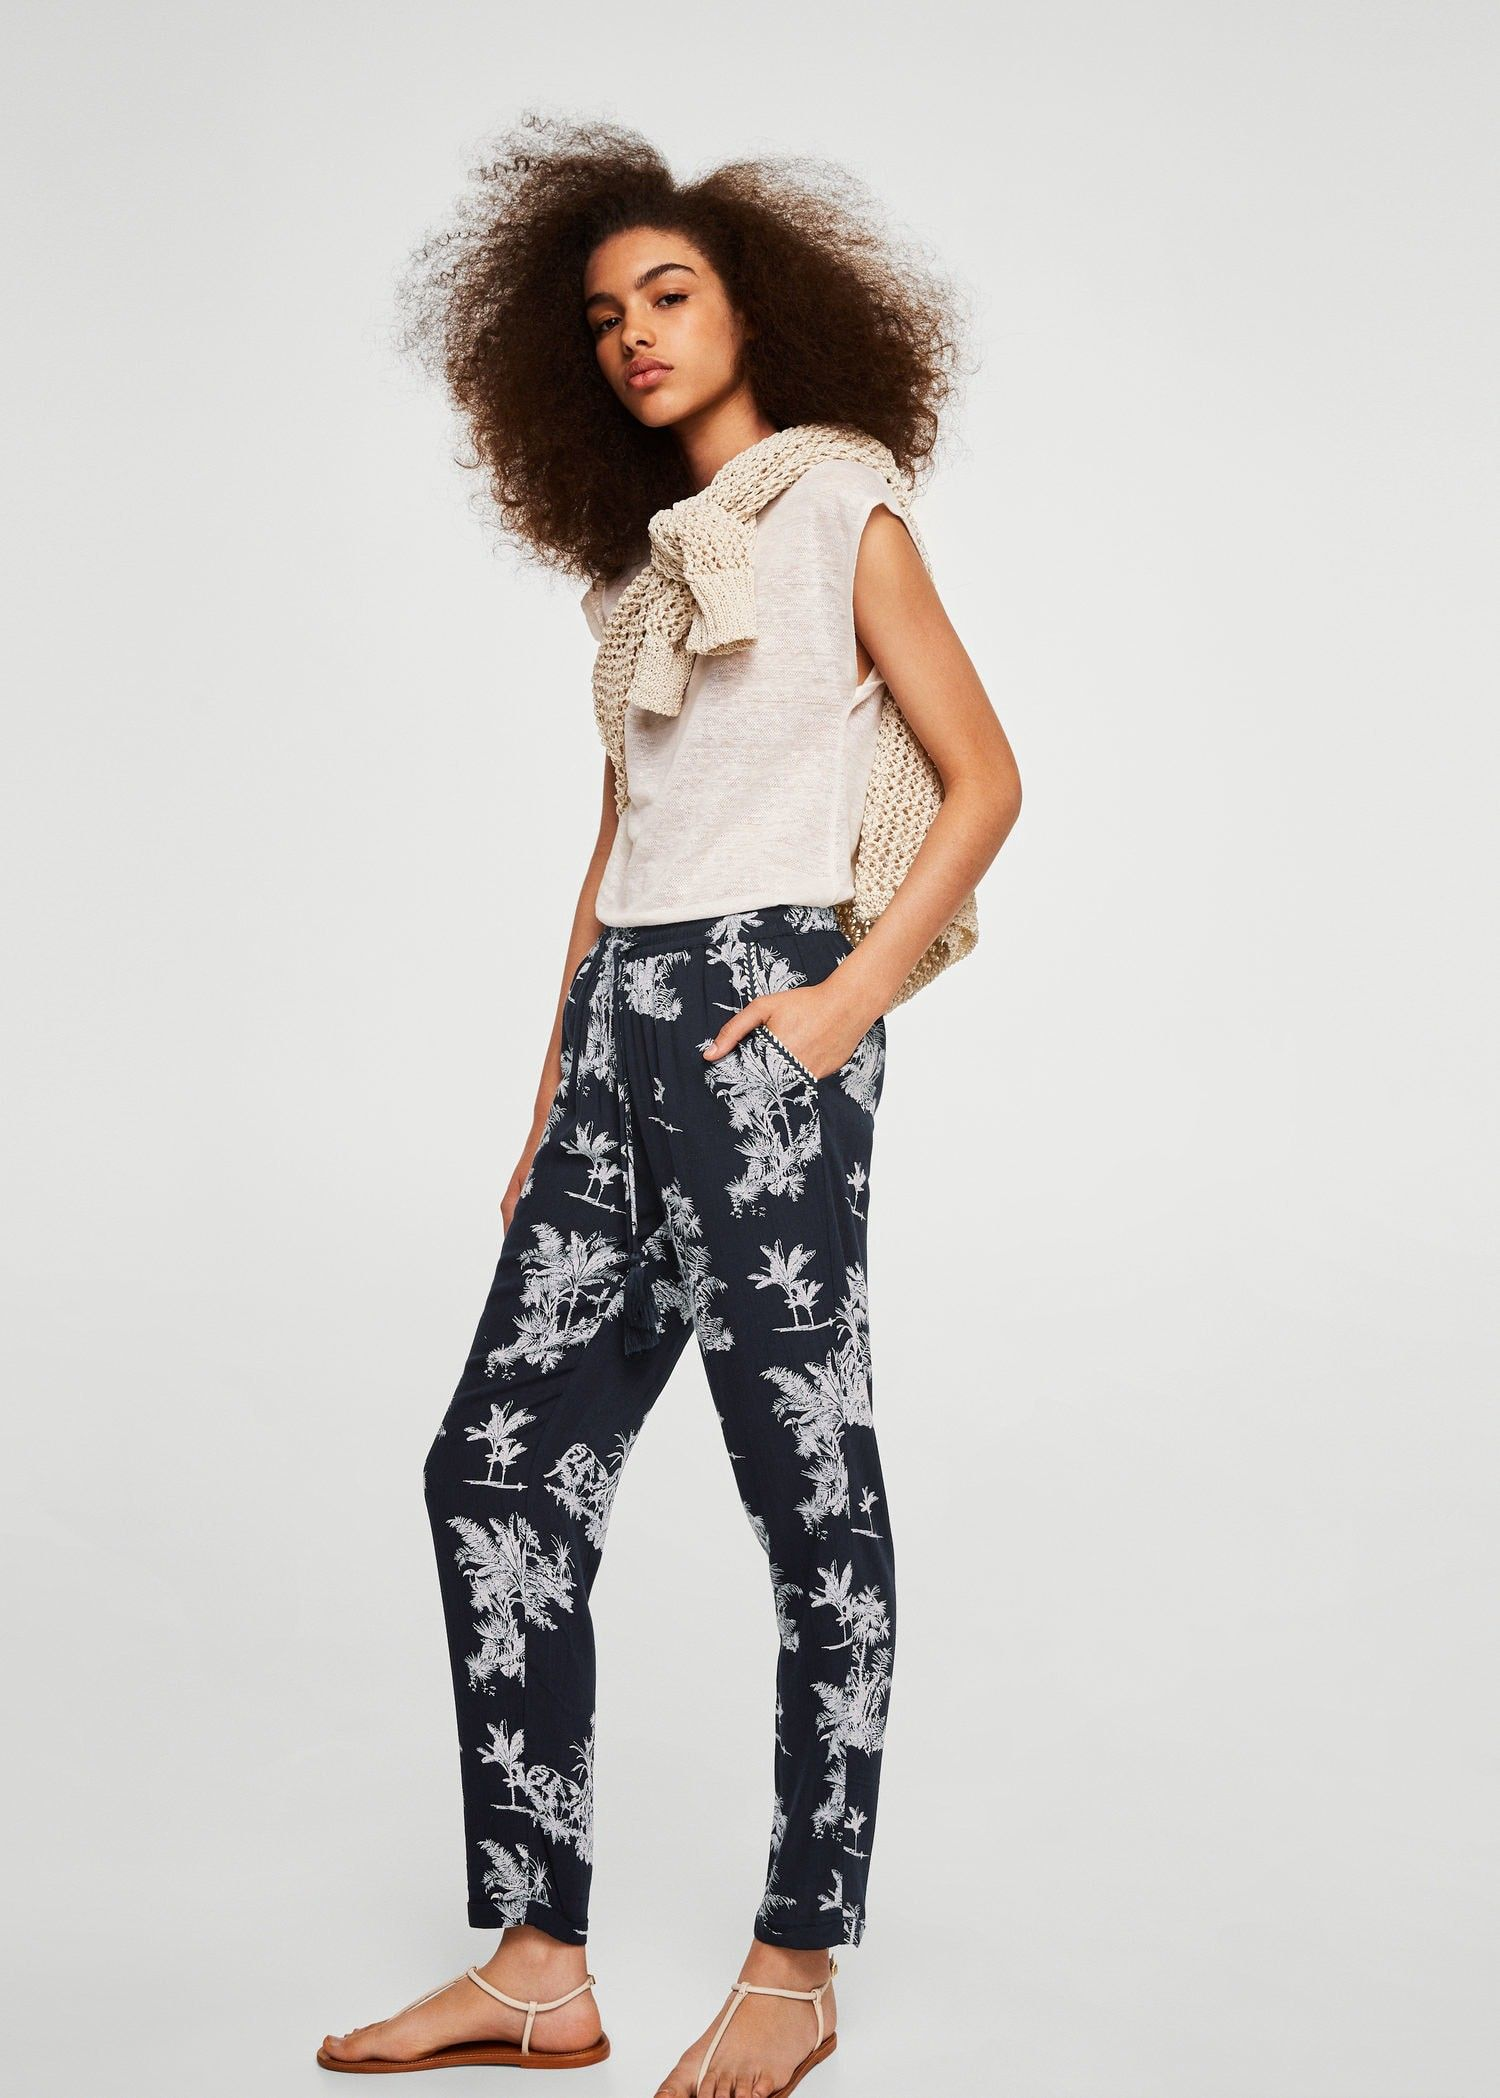 05edabbdb0f7 Mango Flowy Printed Trousers - XS